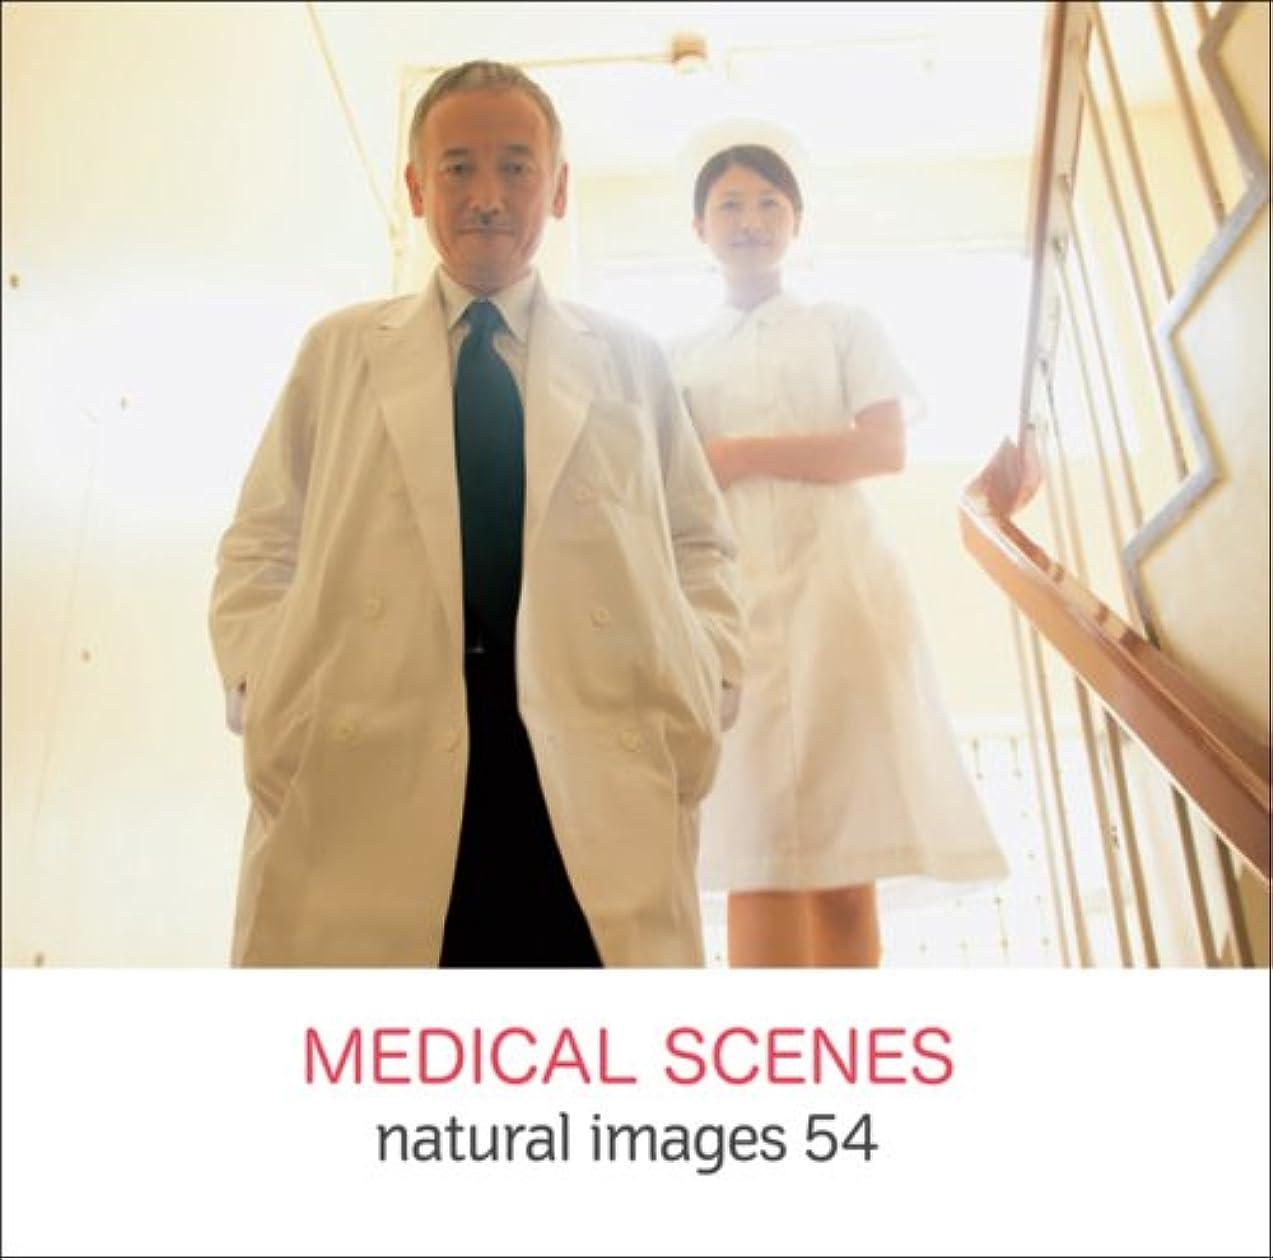 natural images Vol.54 MEDICAL SCENES